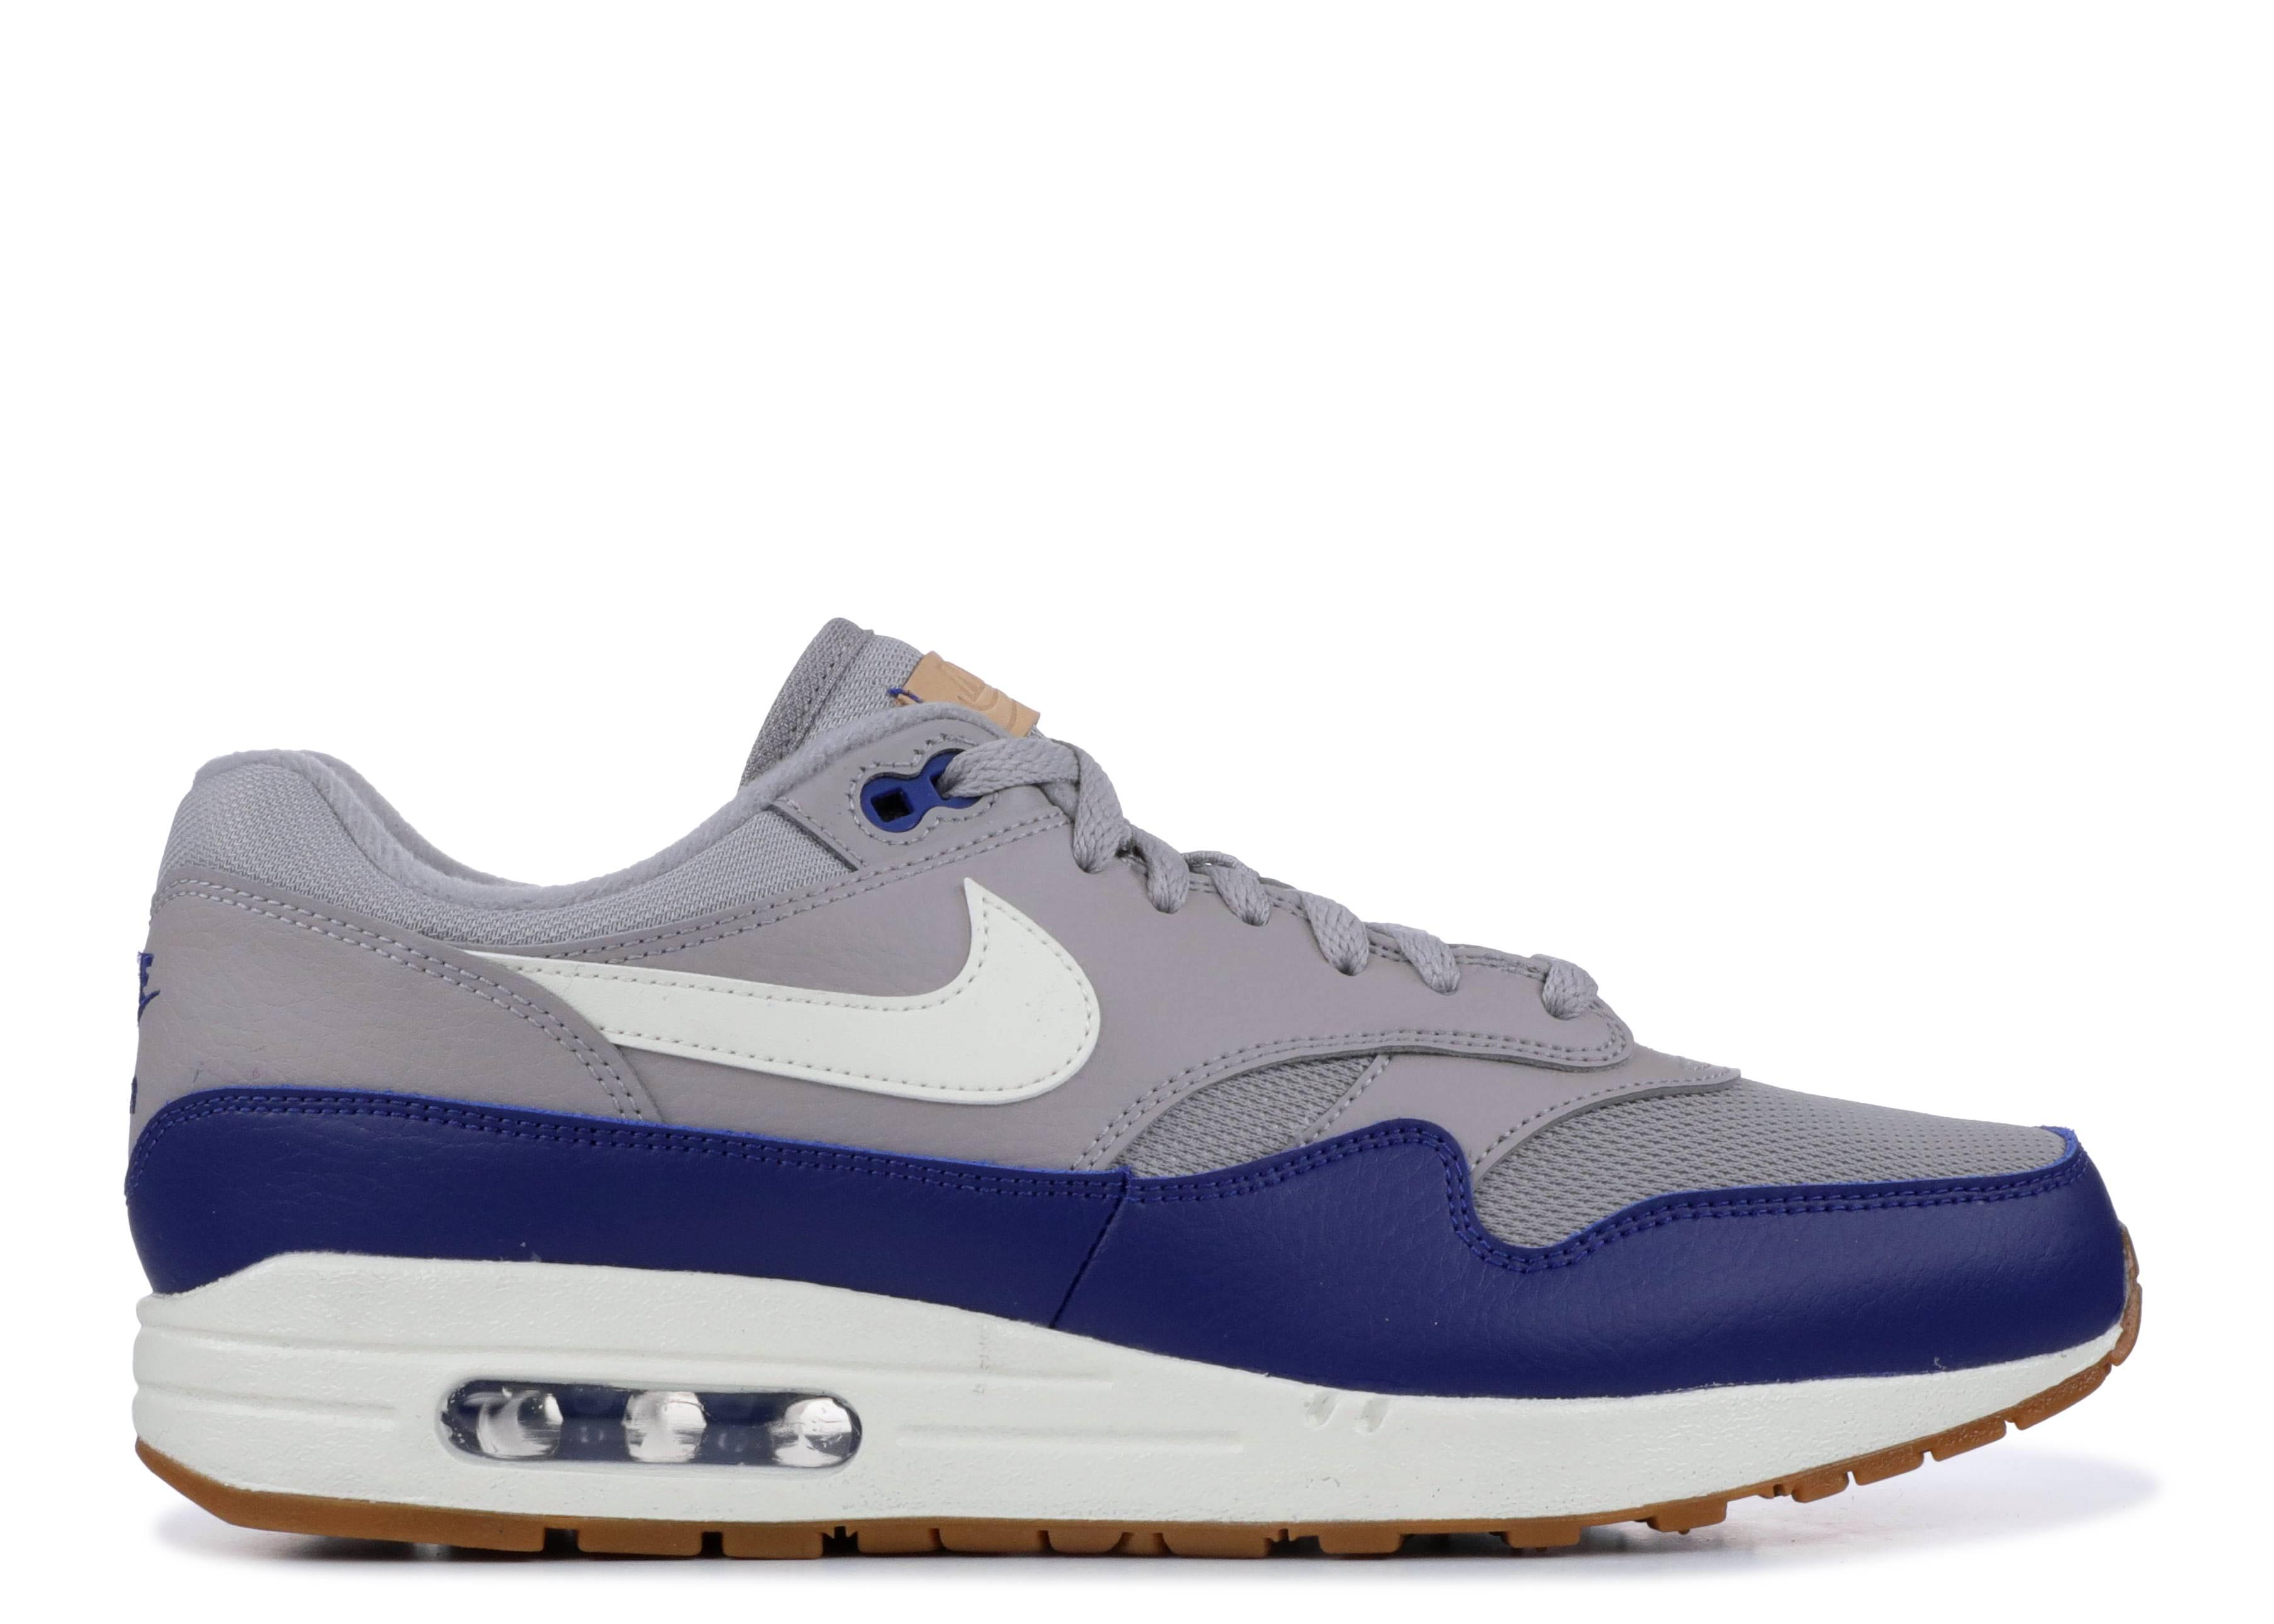 nike air max one grey blue